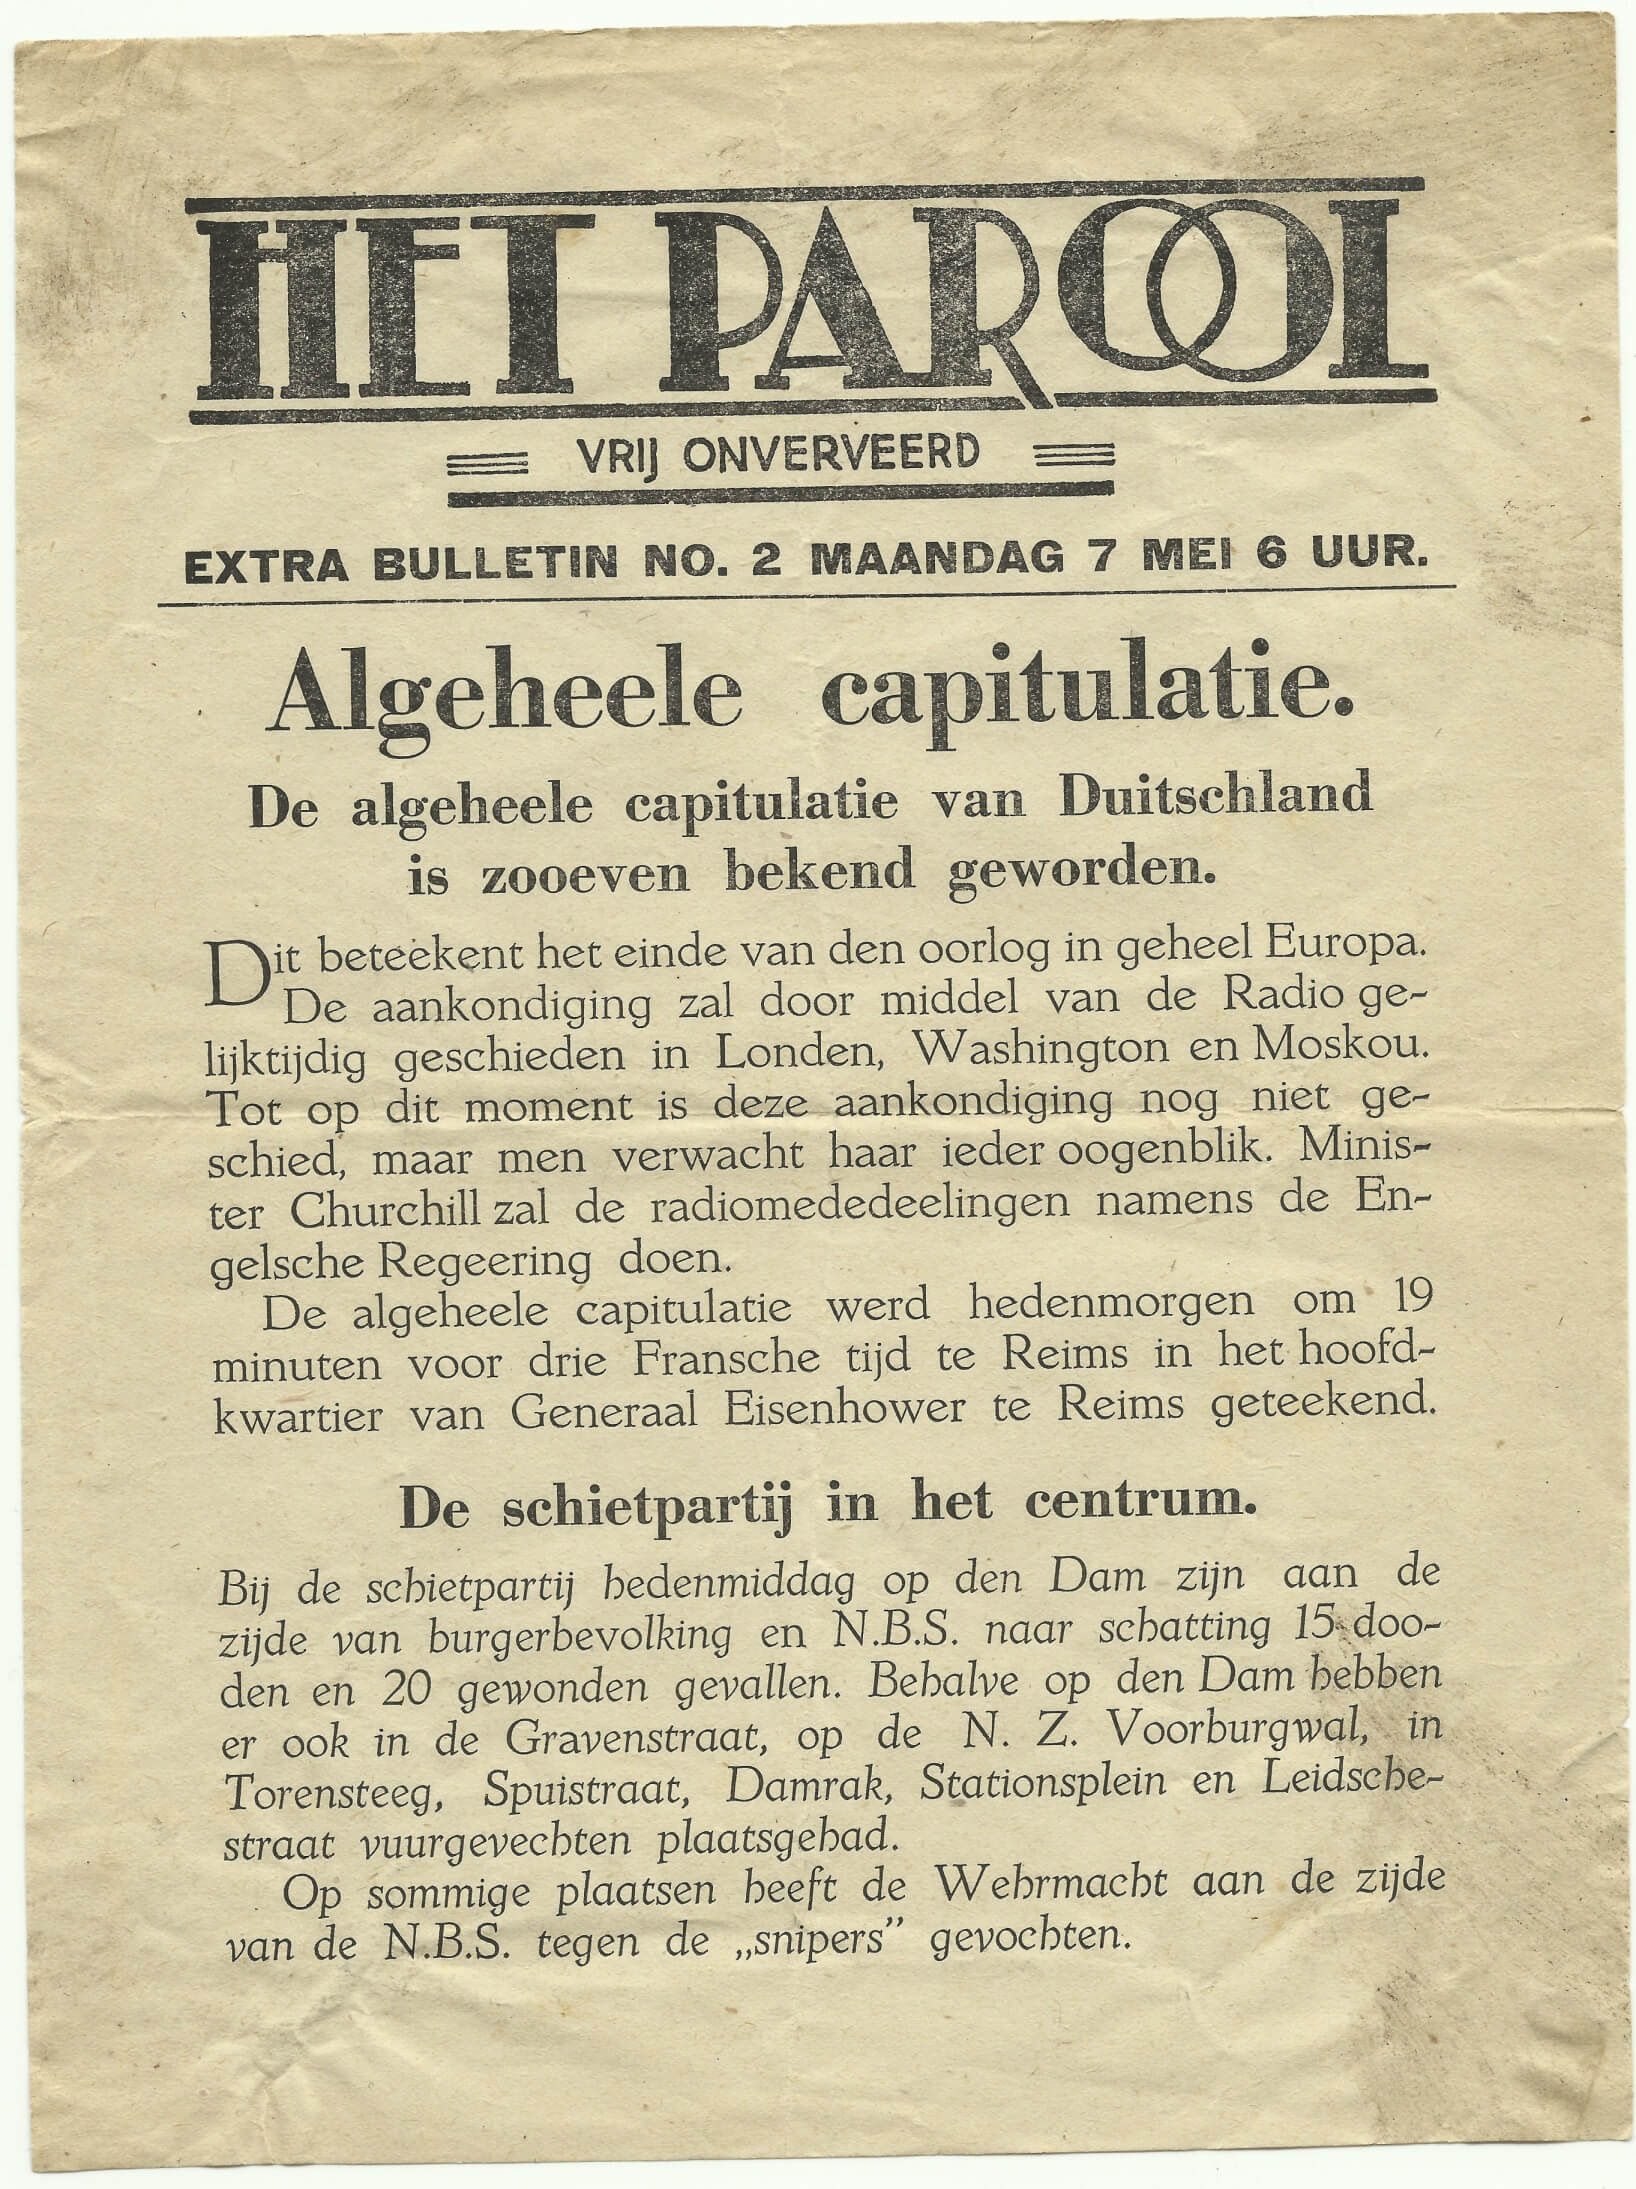 Het Parool Amsterdam 7 mei 1945